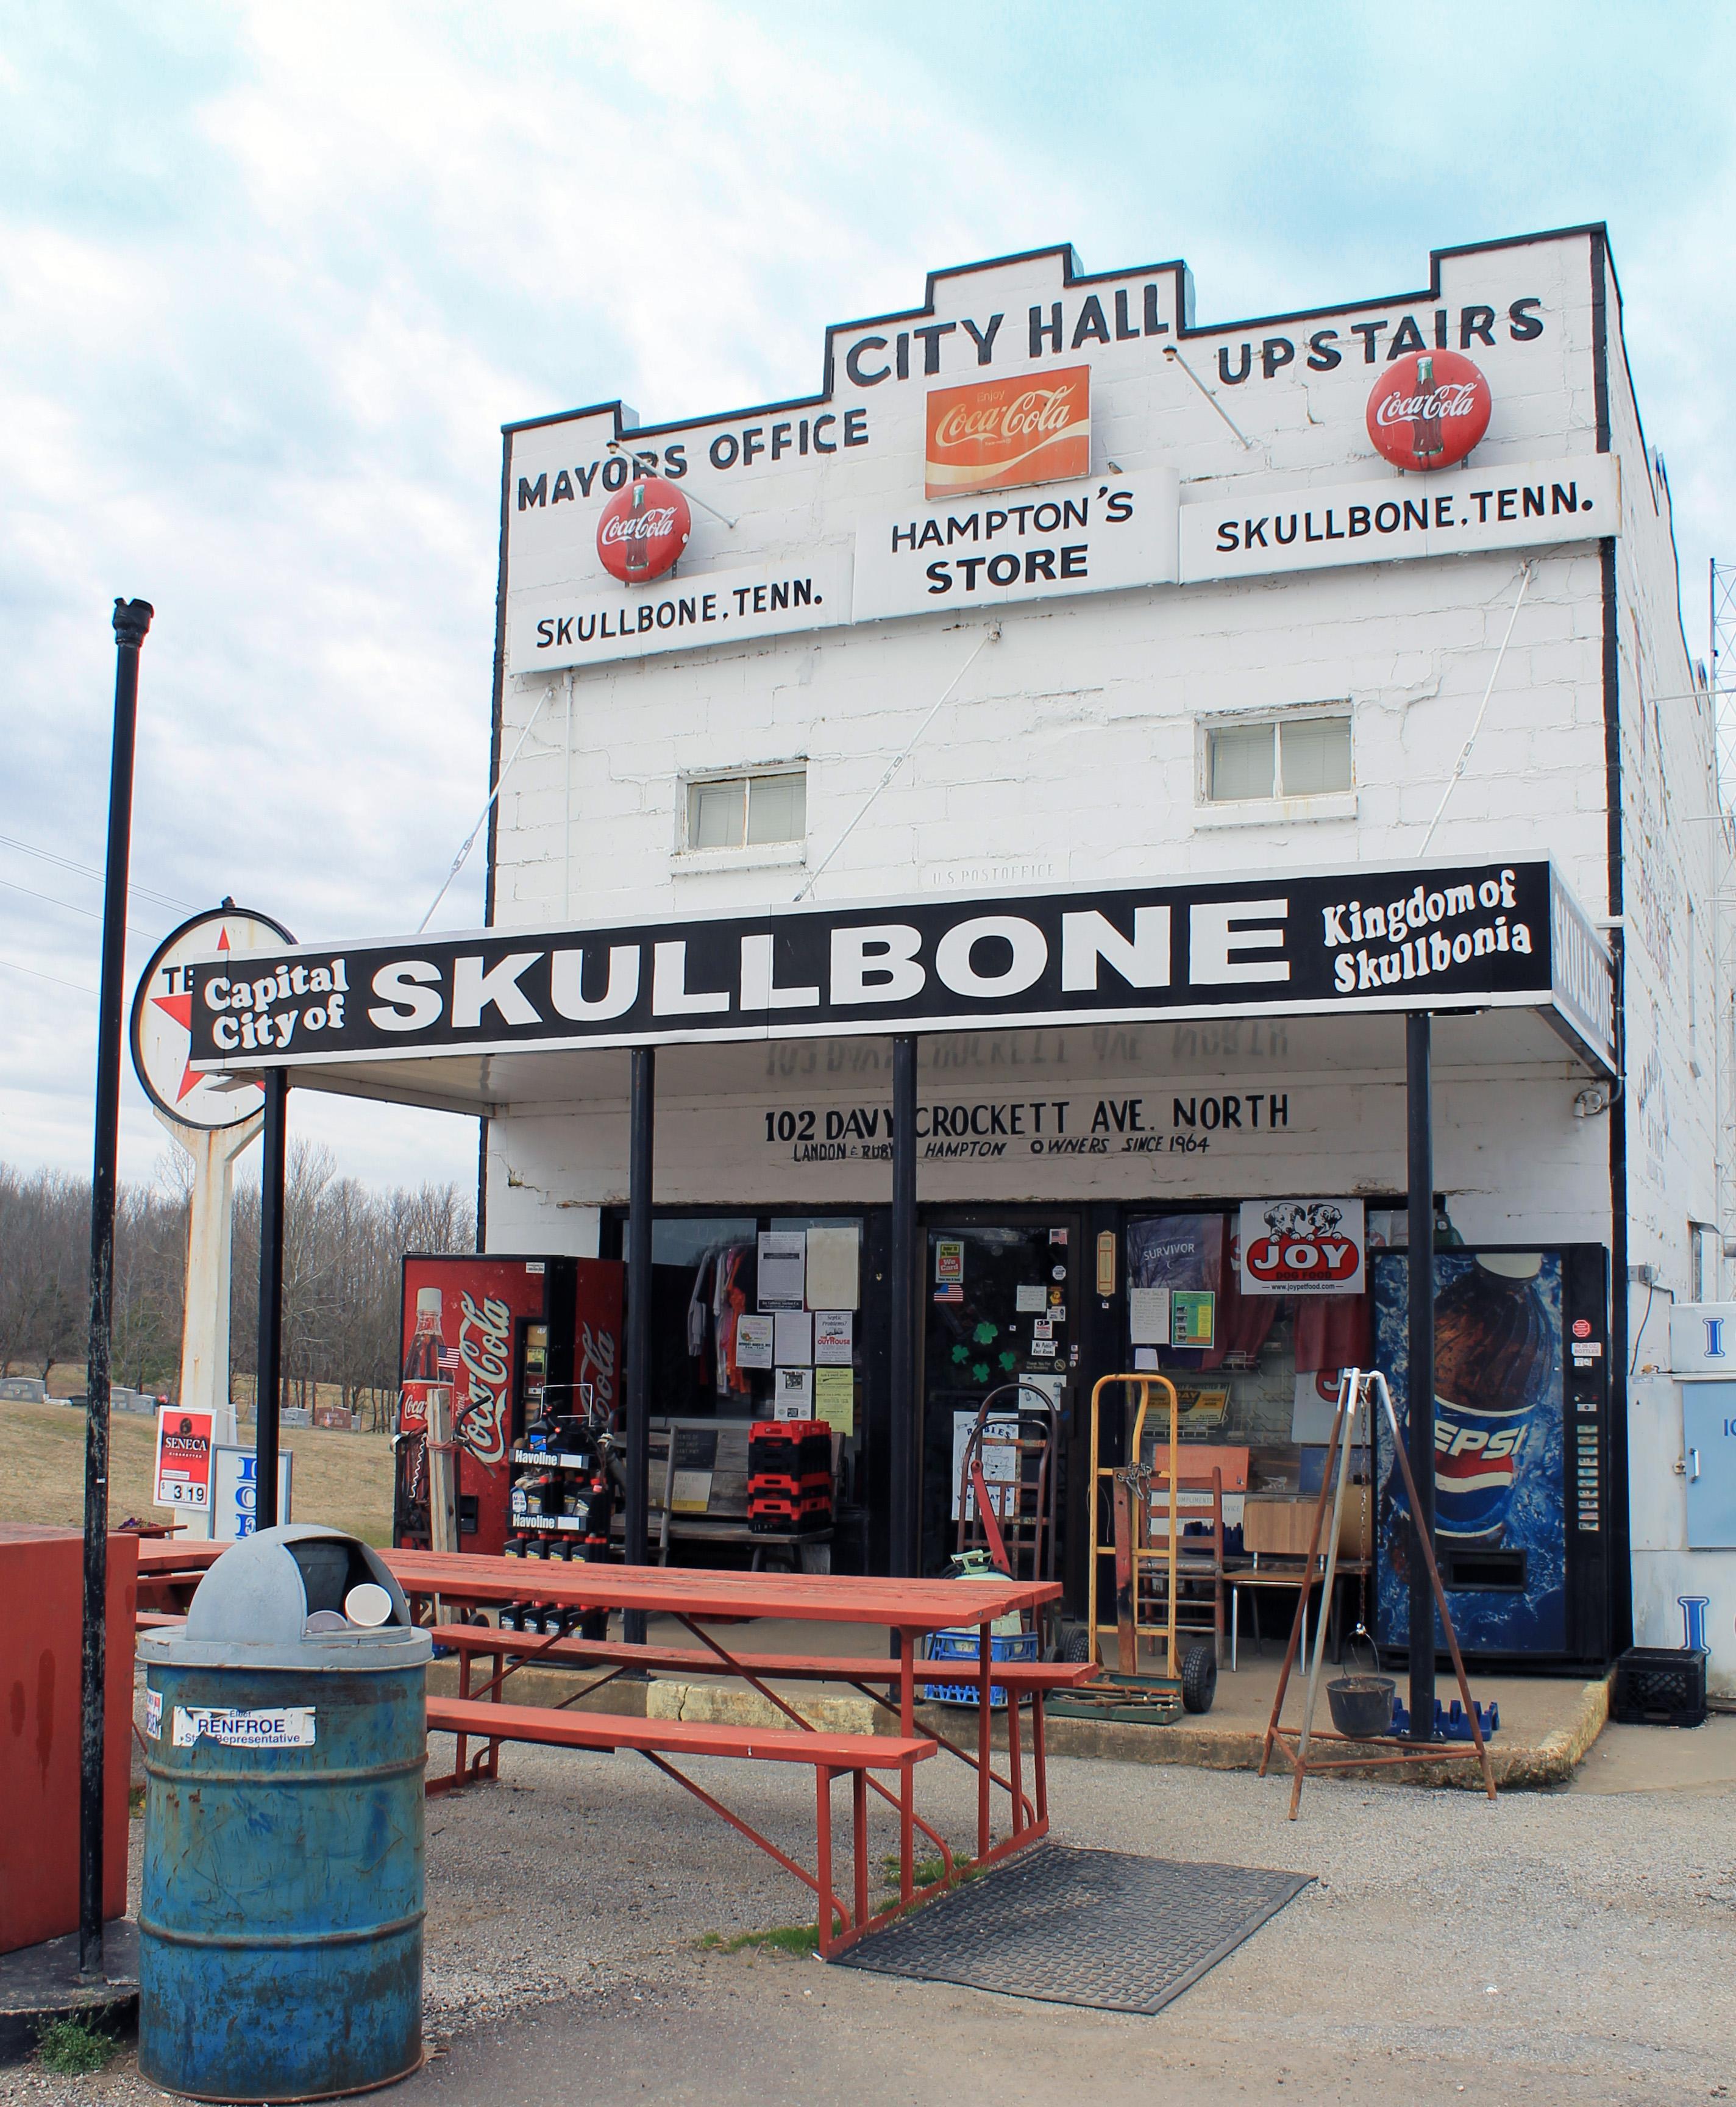 Skullbone, Gibson County, Tennessee